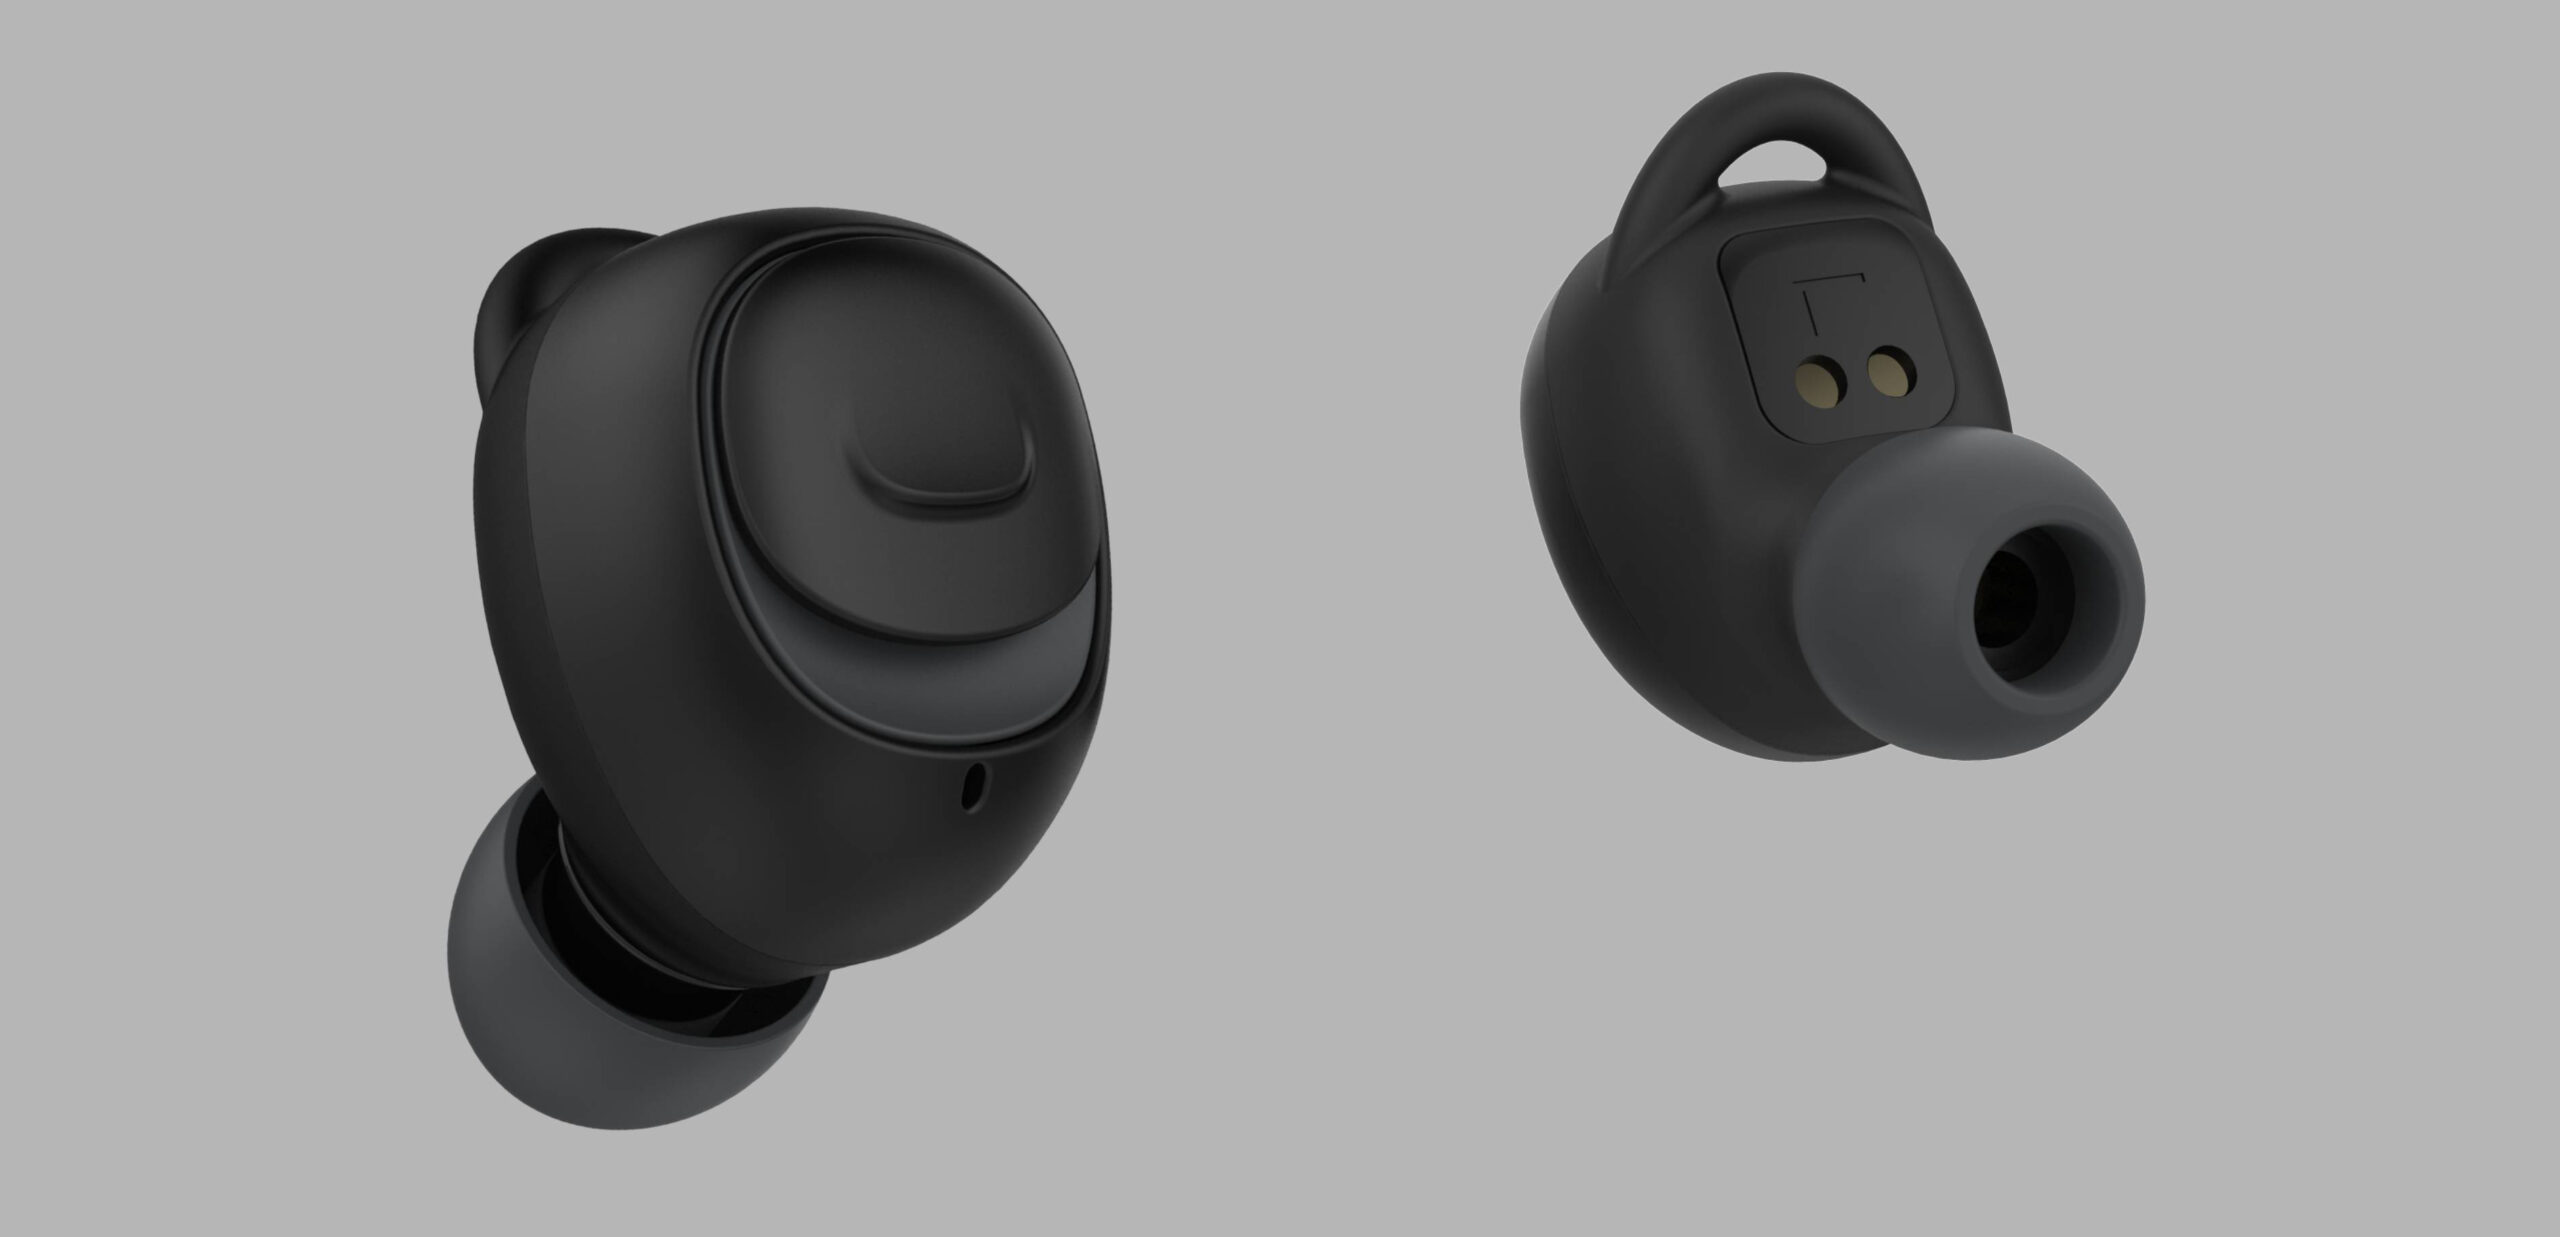 Слушалки Bluetooth 5.0 Havit I93